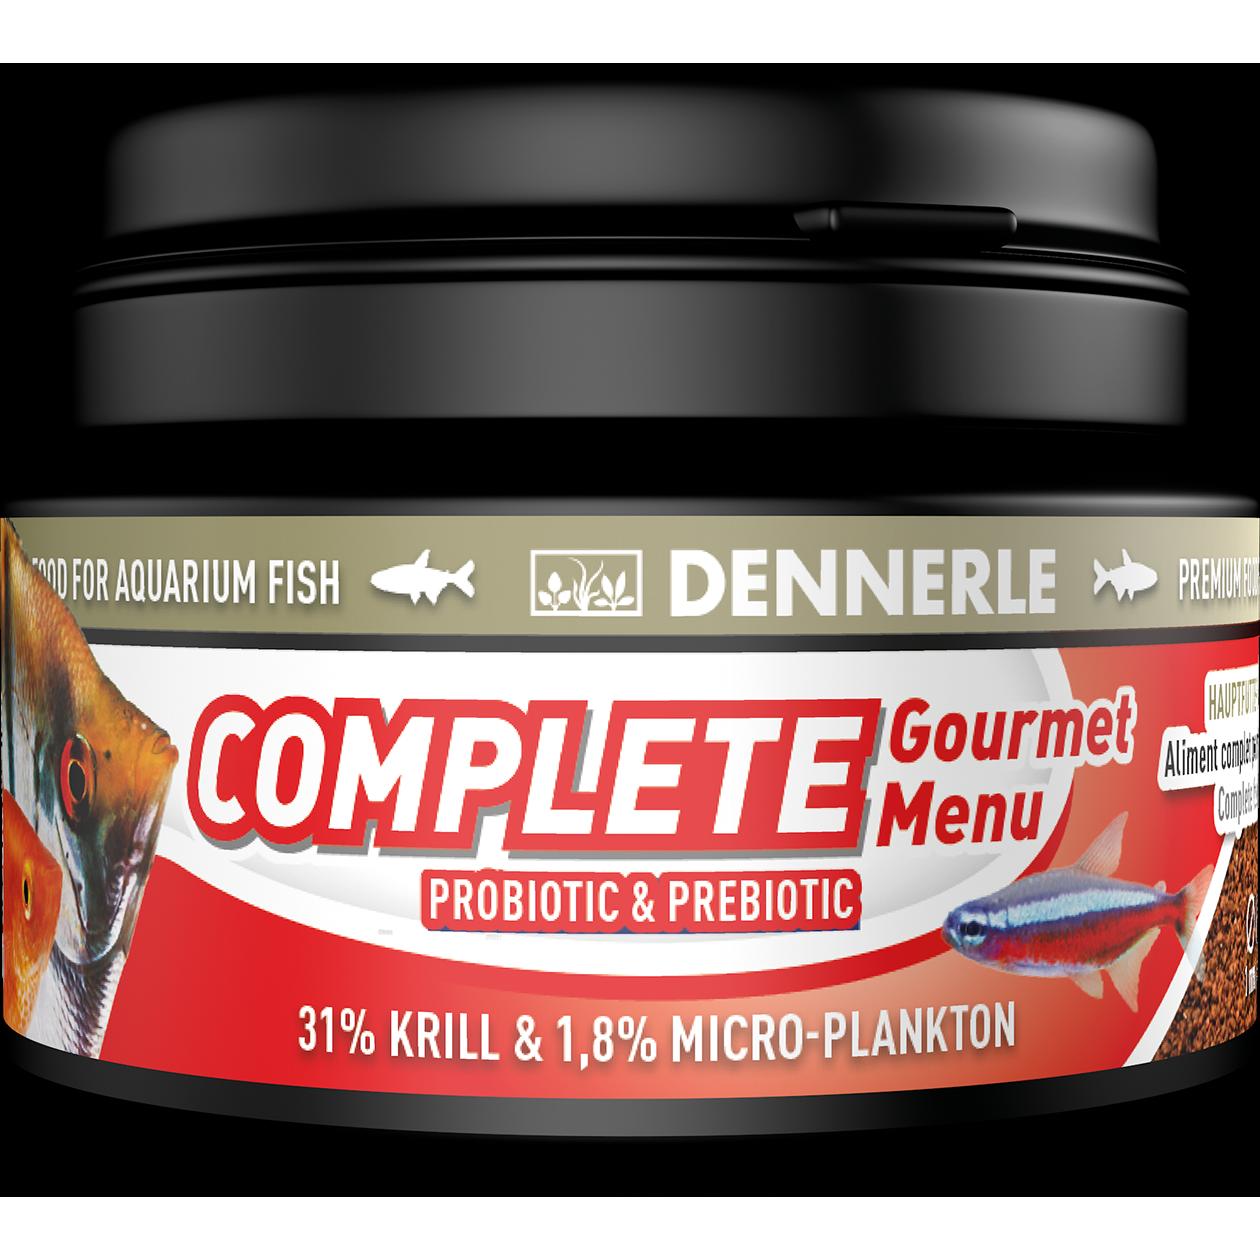 Dennerle Complete Gourmet Menu, Bild 4